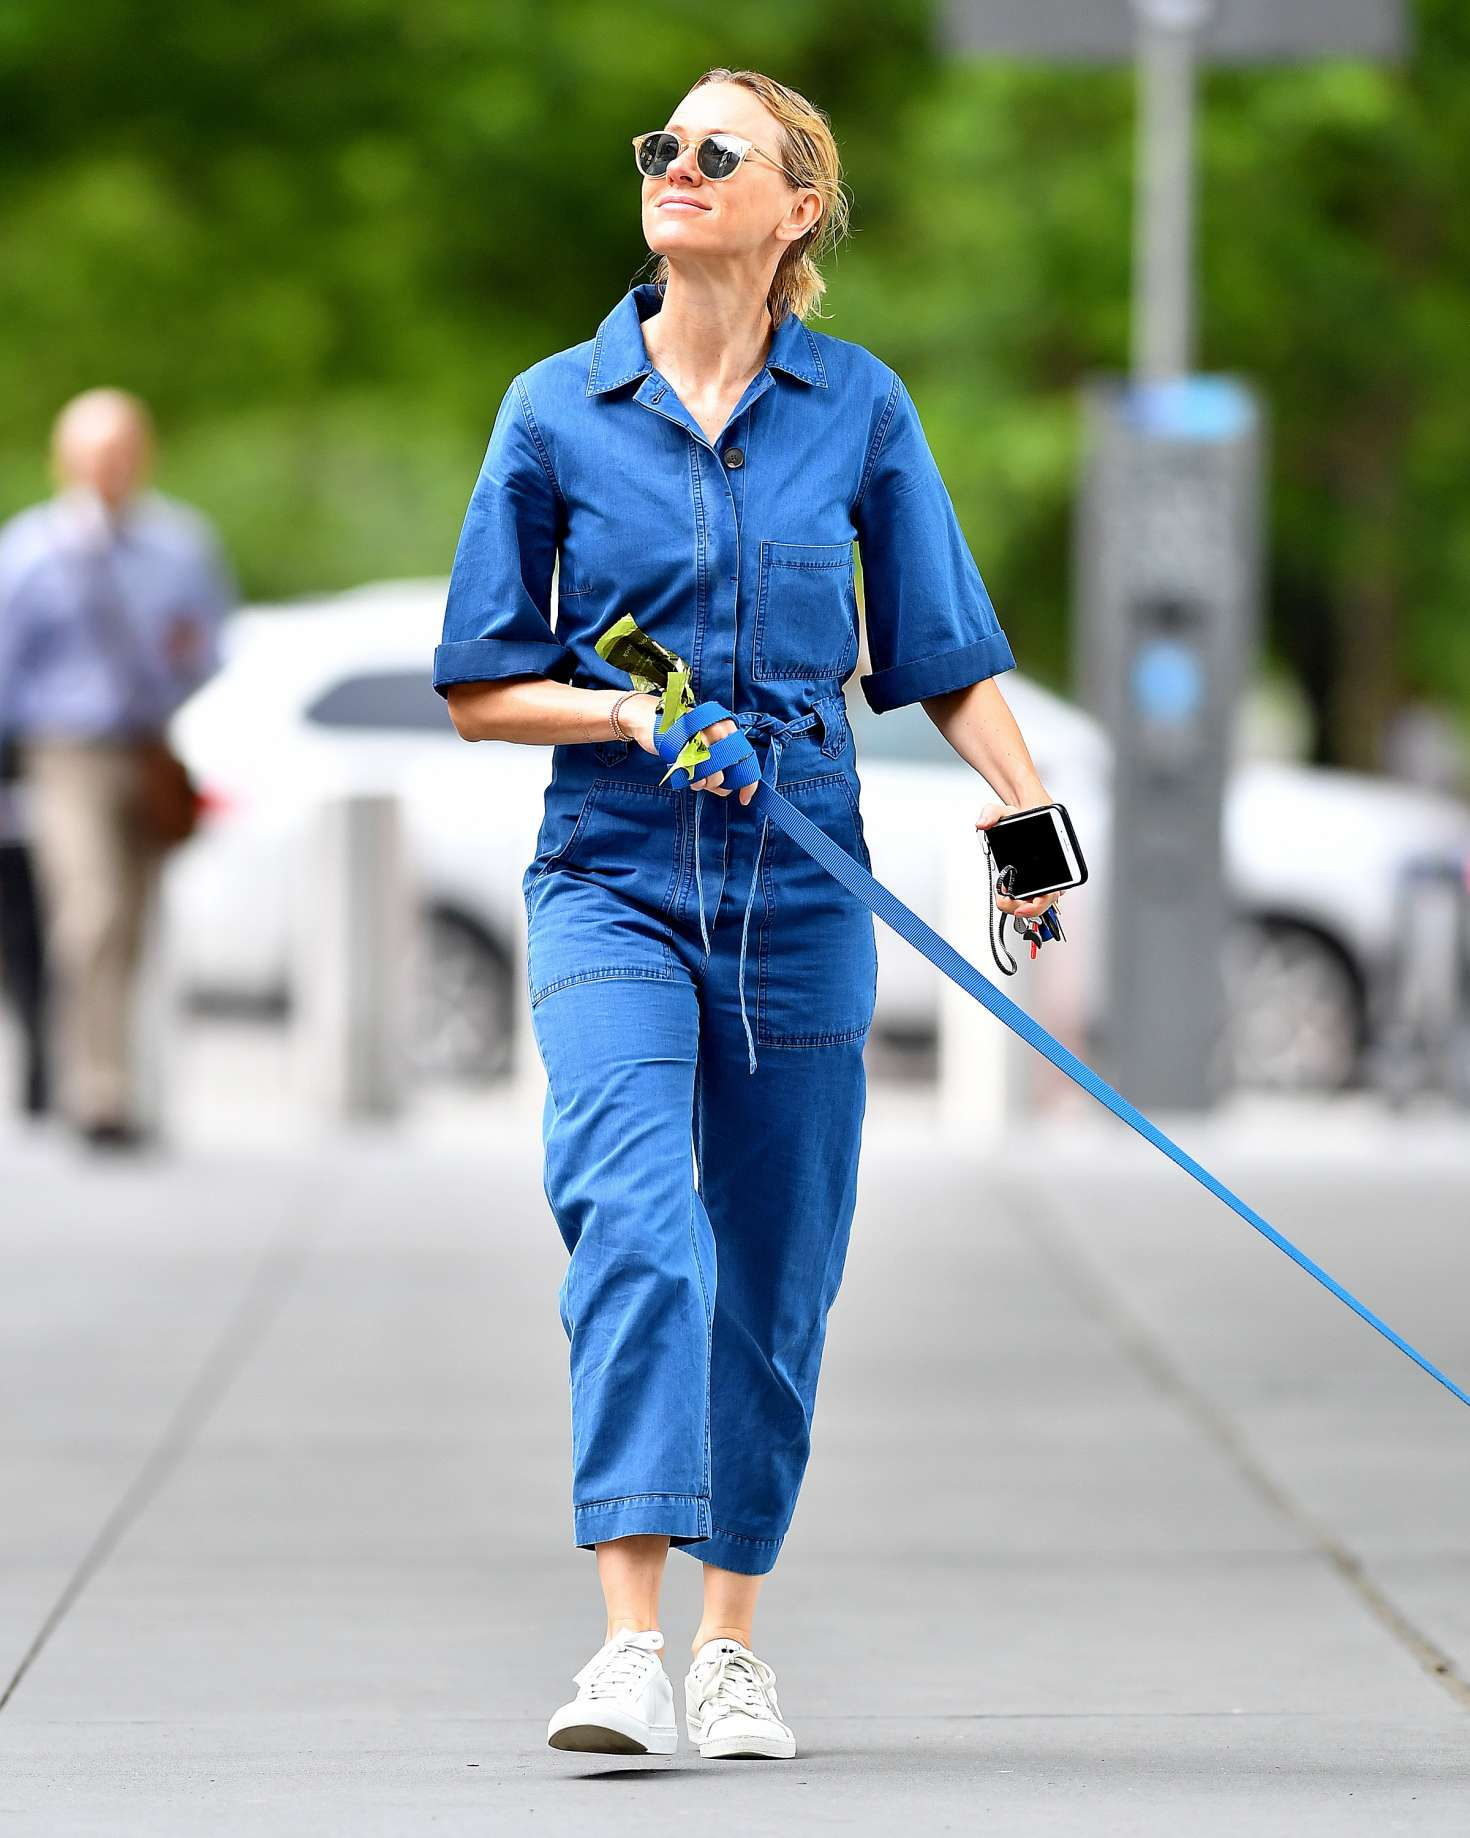 Naomi Watts in Jeans Jumper walking her dog in New York